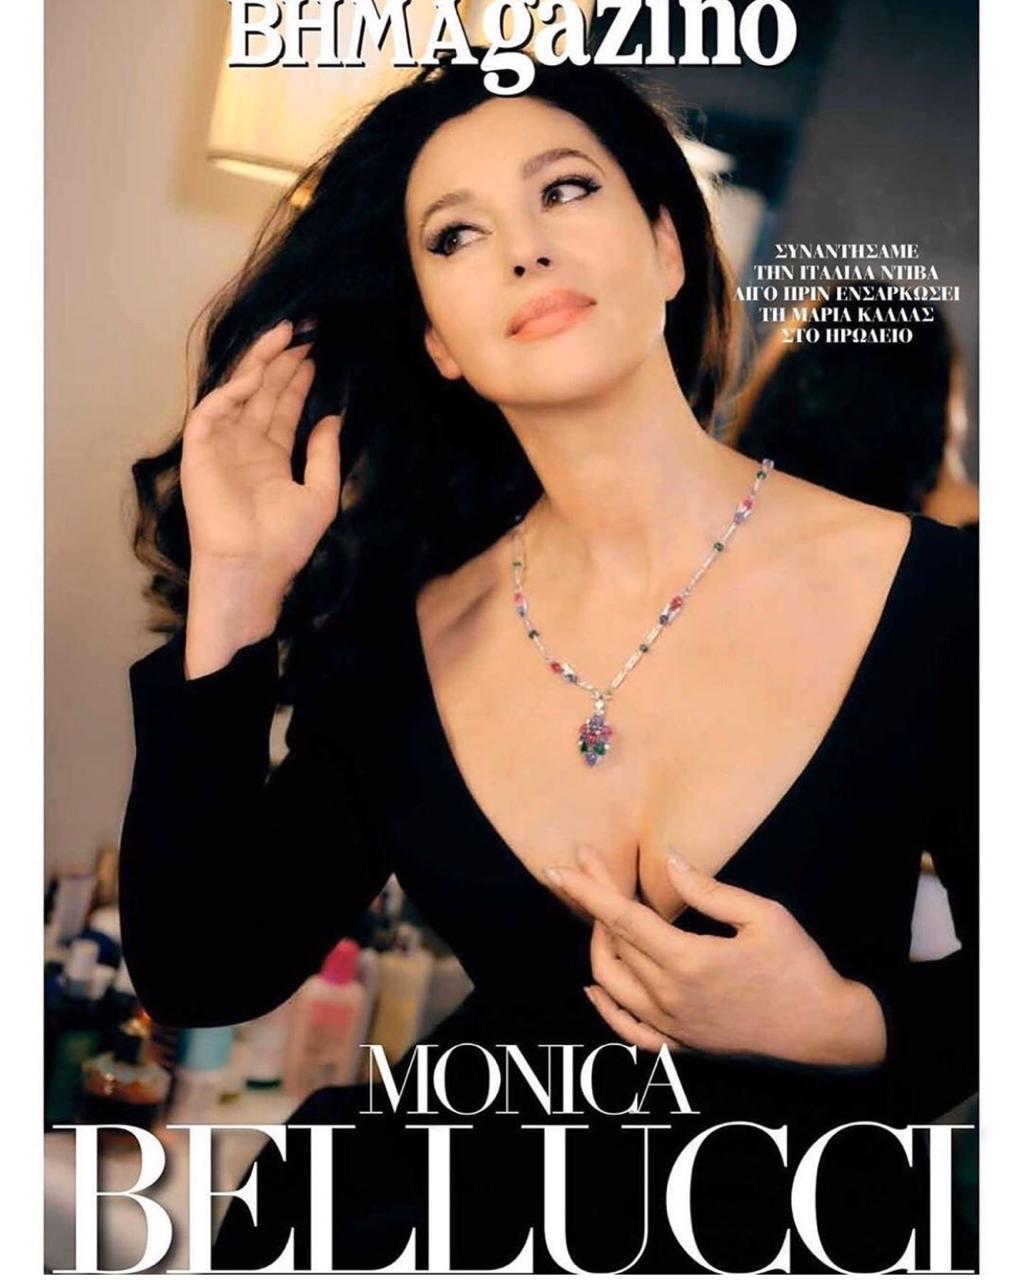 مونيكا بيلوتشي (7)